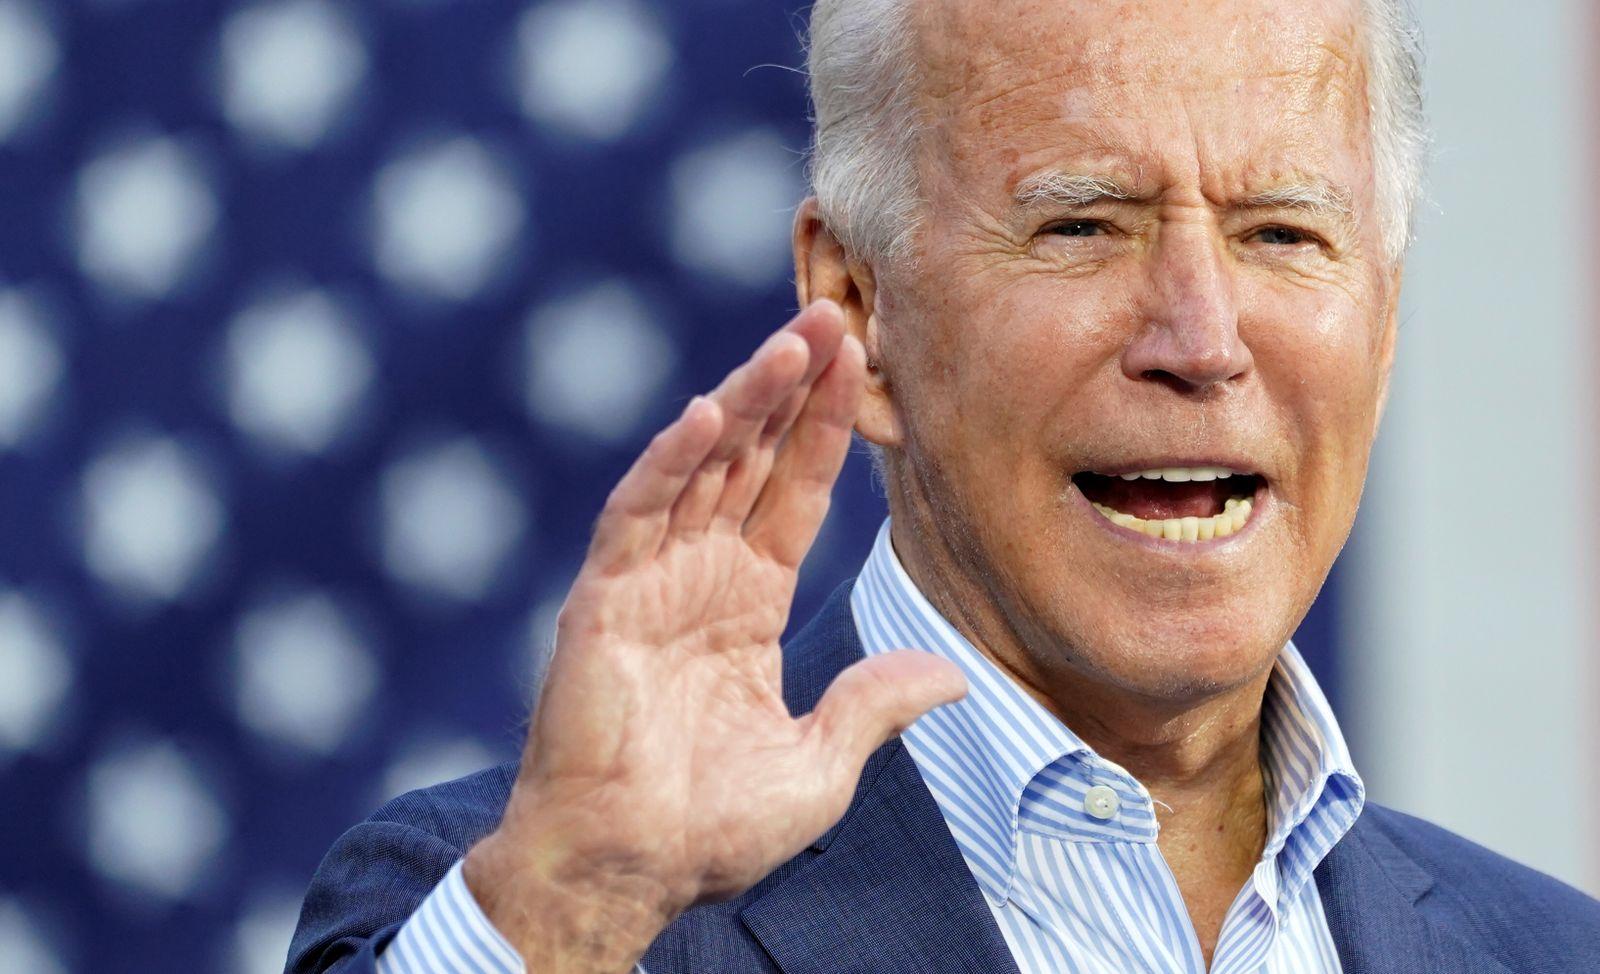 U.S. Democratic presidential candidate Joe Biden campaigns in Erie, Pennsylvania